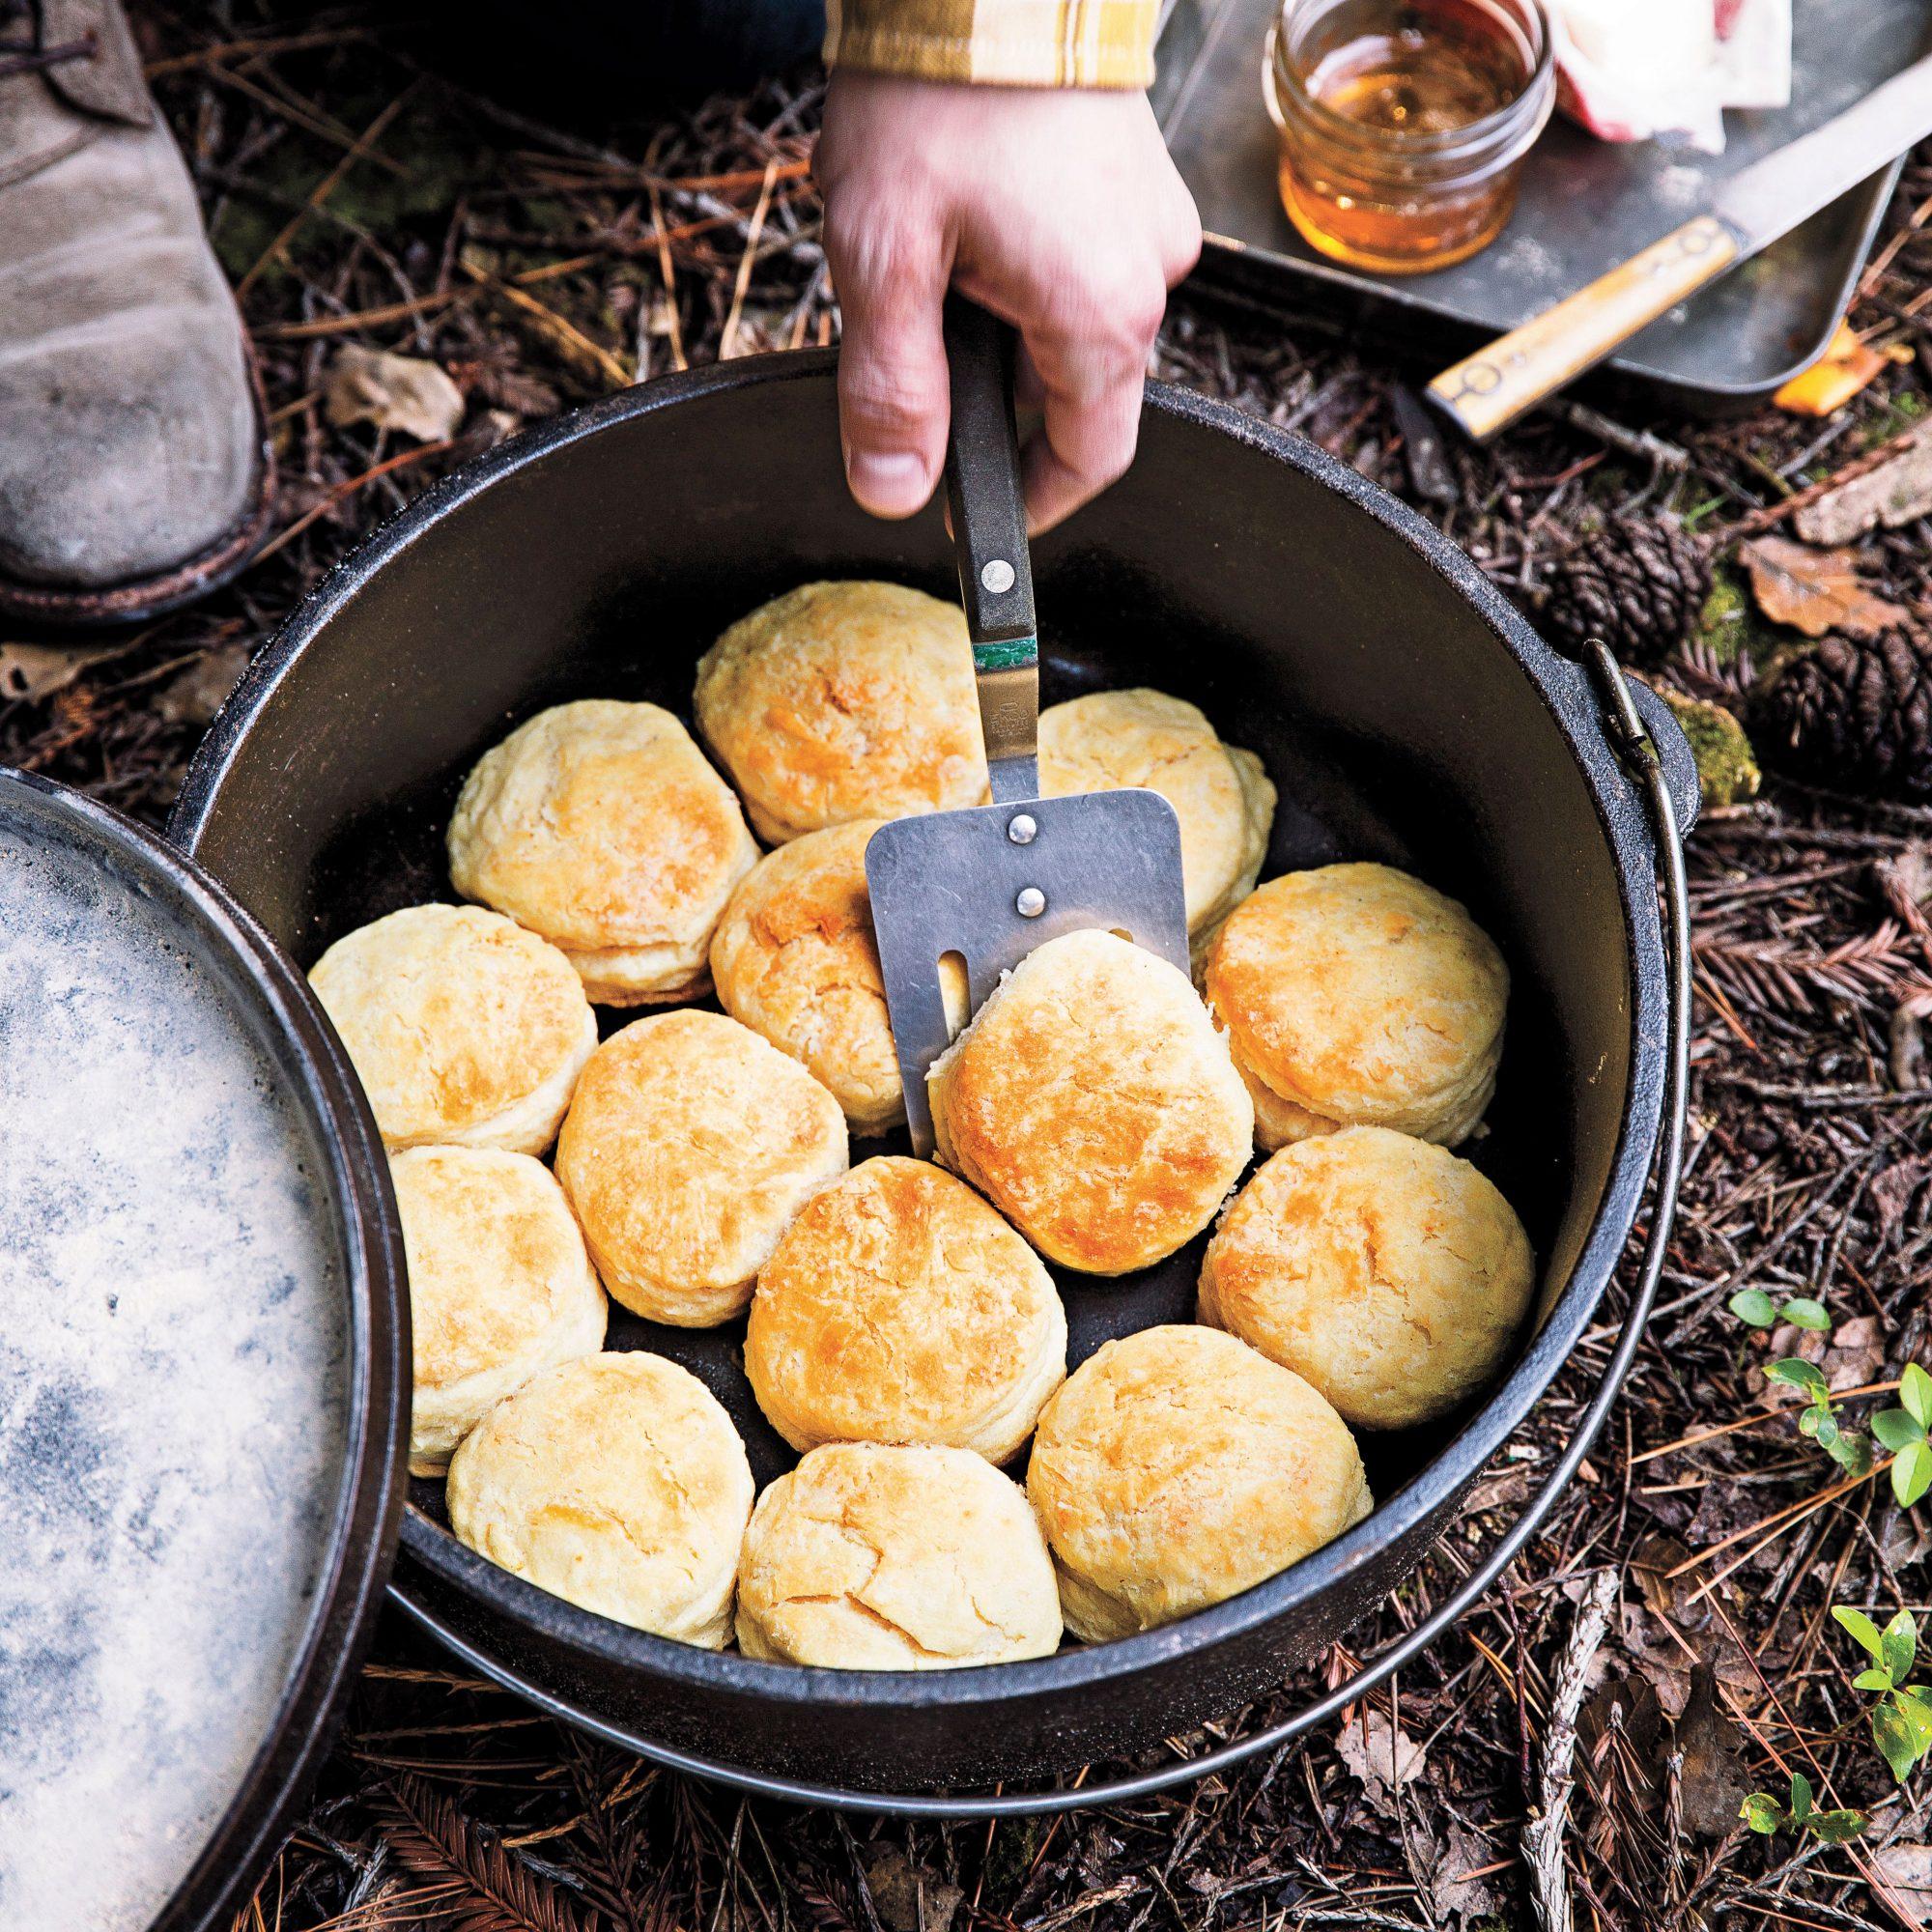 Mark Klever's Dutch Oven Biscuits